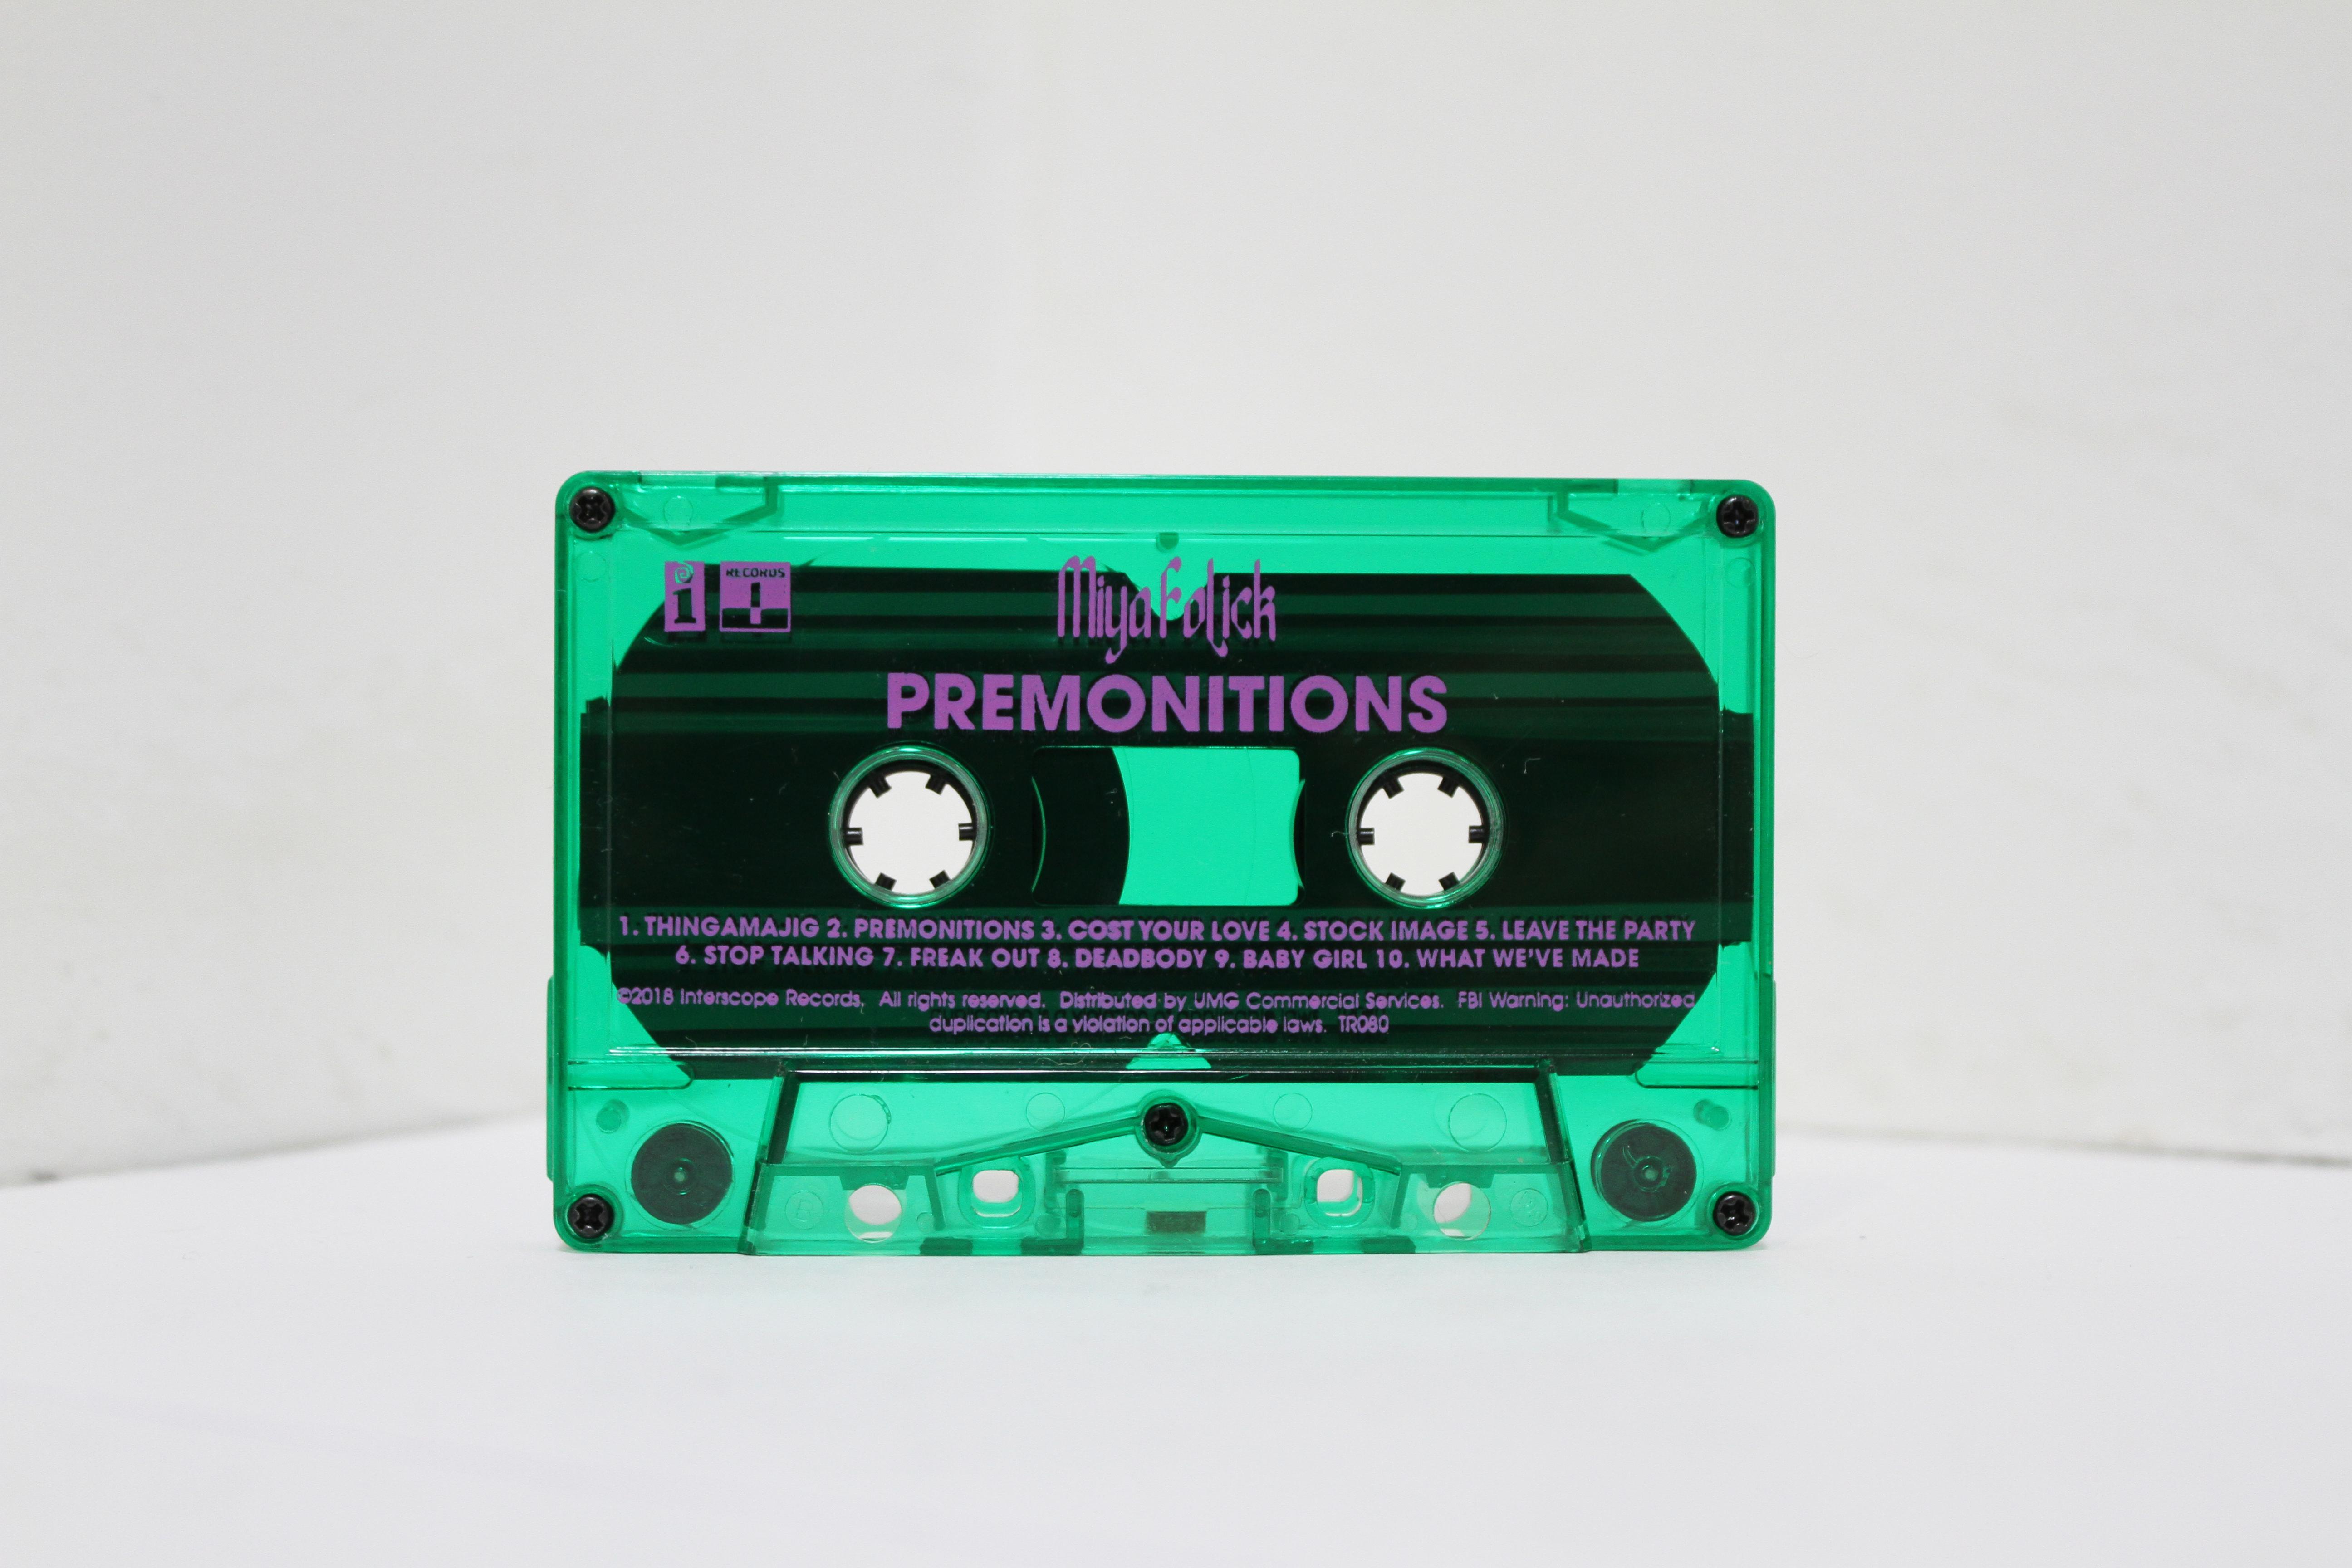 Miya Folick - Premonitions